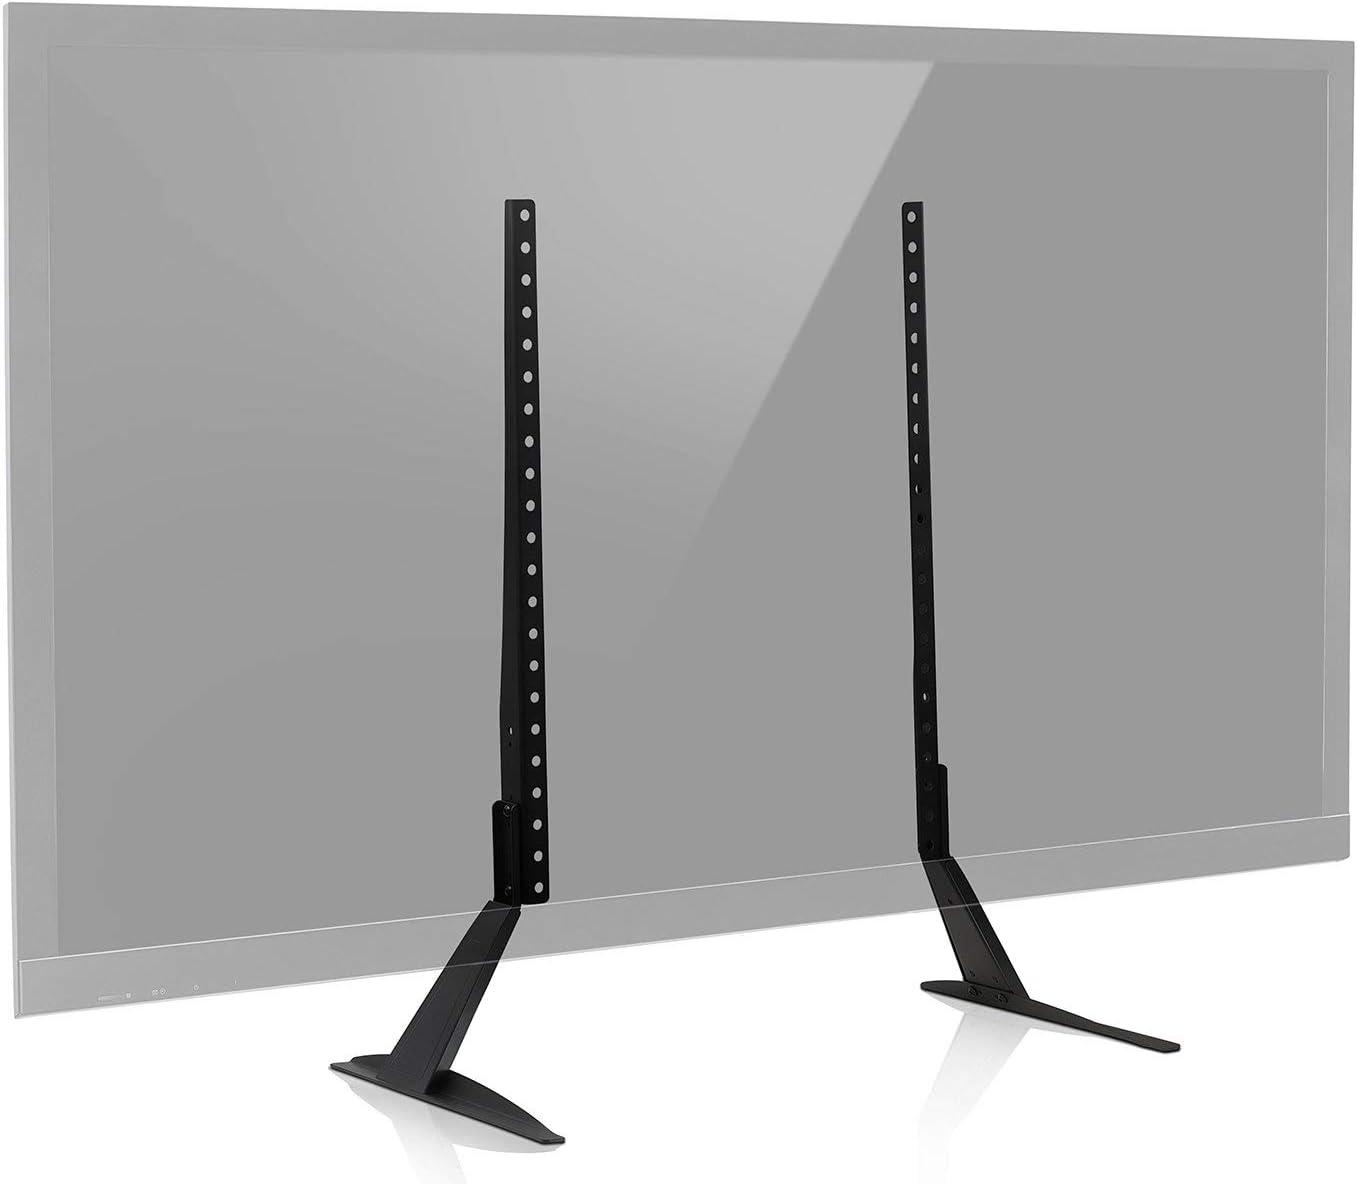 Mount-It Universal TV Stand Base overseas [Alternative dealer] Table top Pedesta Replacement